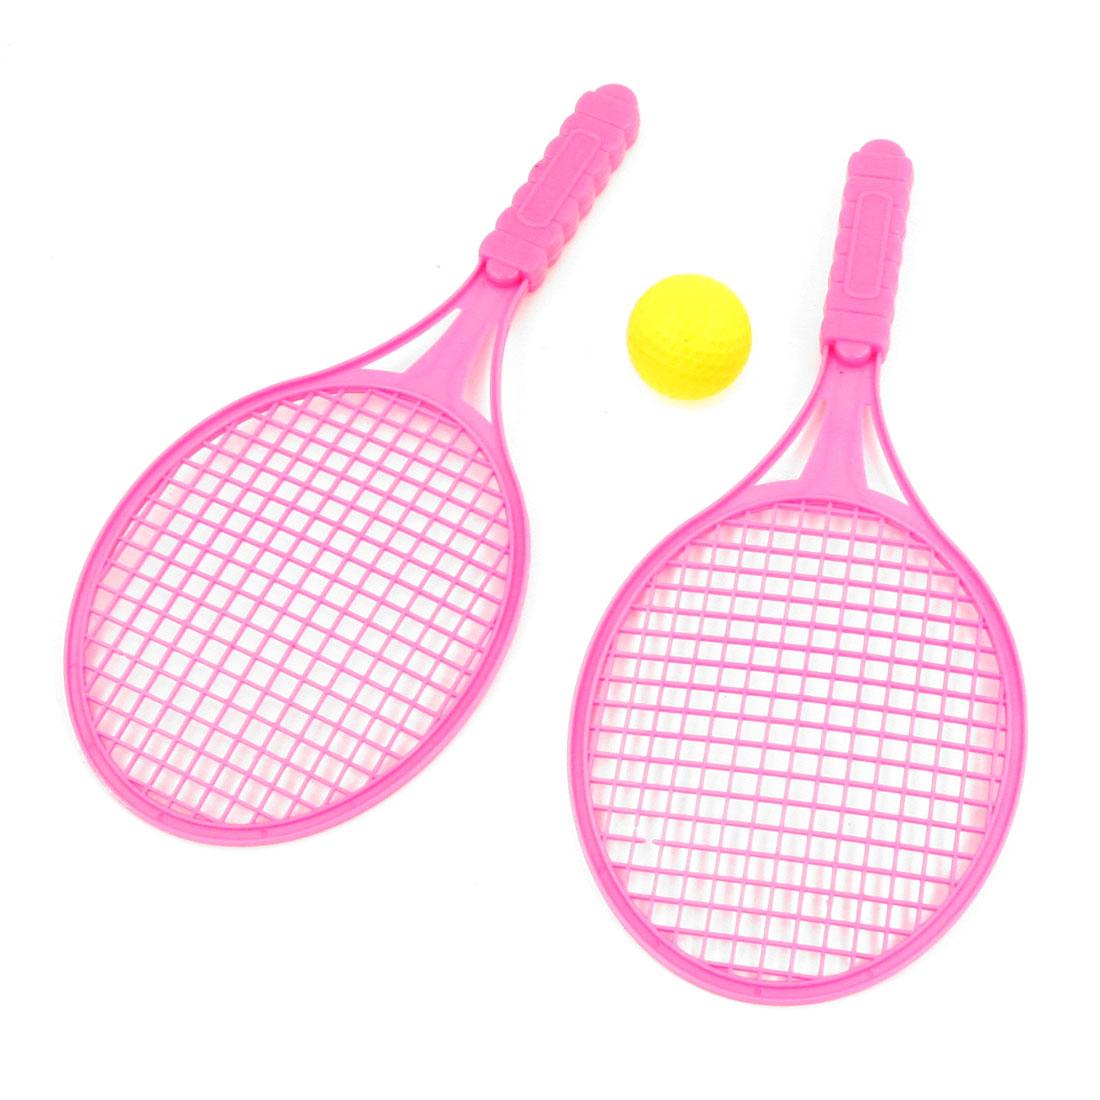 3 in 1 Fuchsia Nonslip Handle Tennis Racket Ball Sport Set for Child